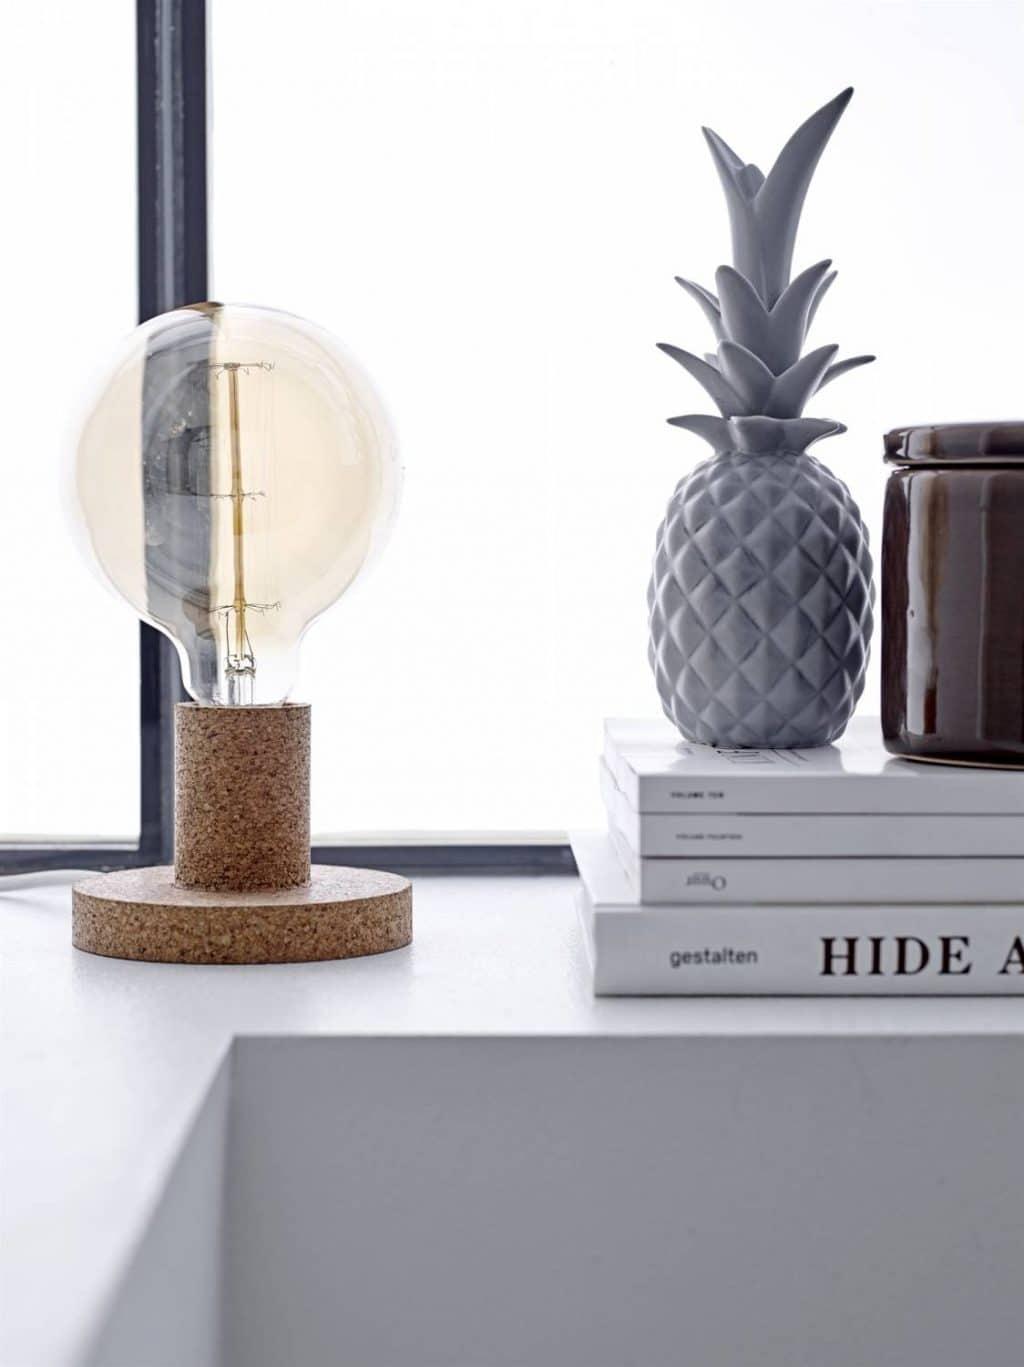 Design lampen in huis interieur insider for Design lampen